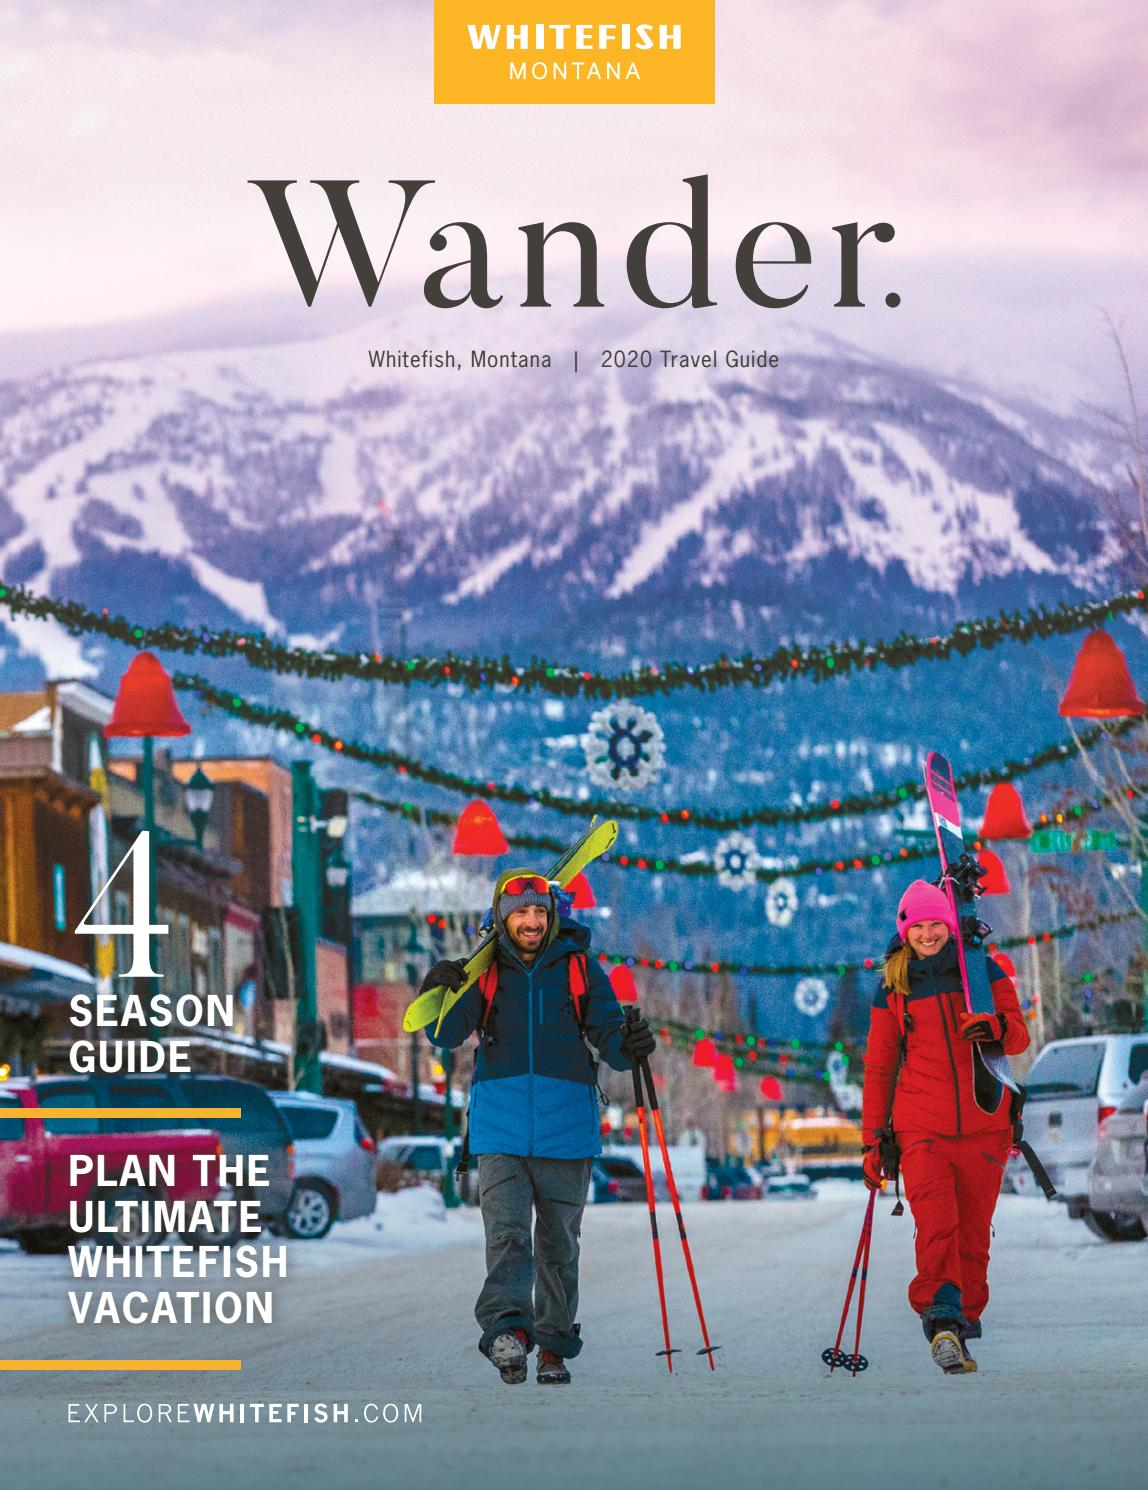 Christmas Carnival Whitefish Mt 2020 Whitefish Montana Travel Guide 2020 by Whitefish Montana   issuu